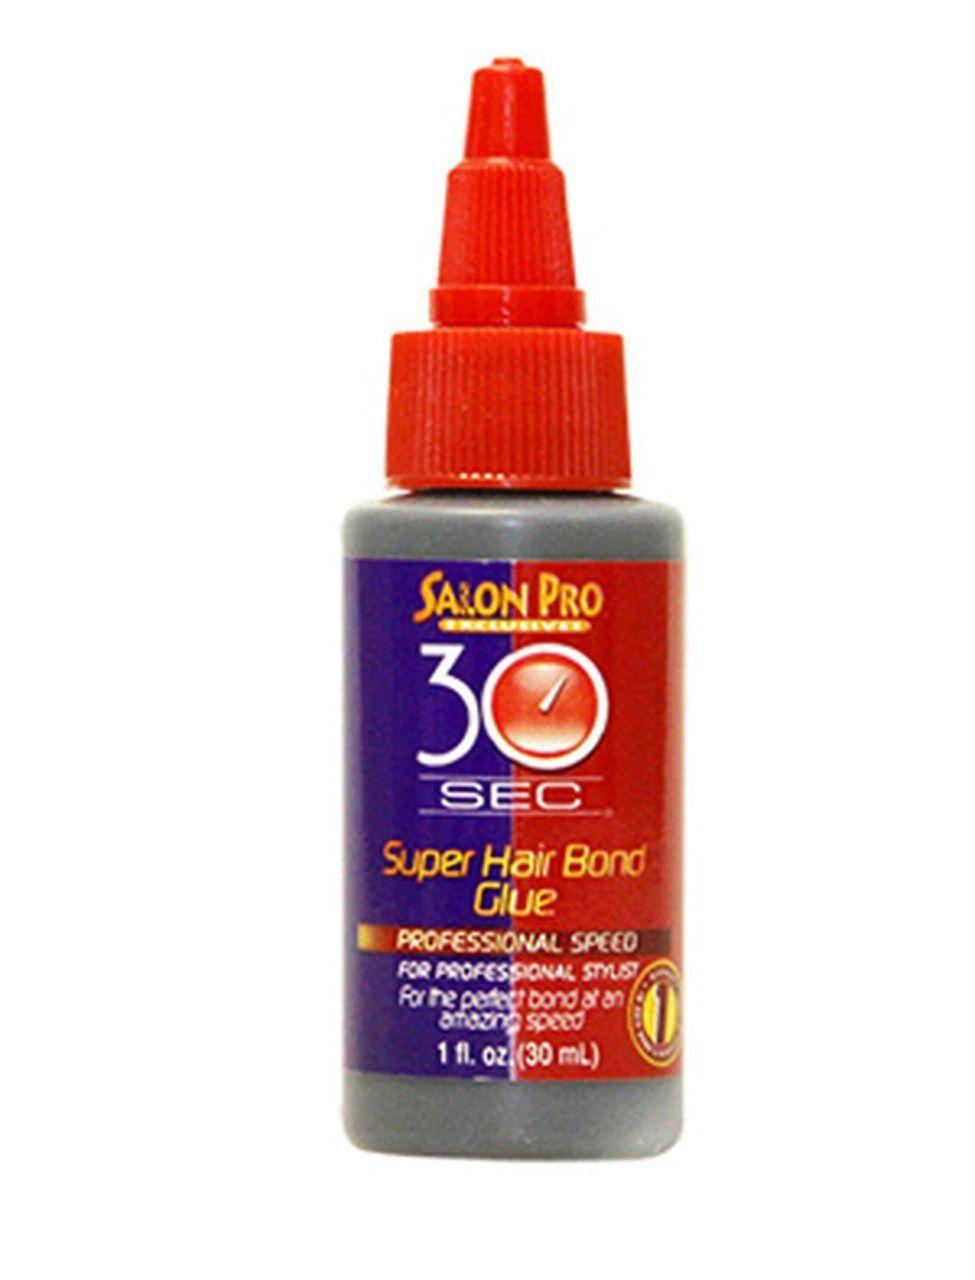 Salon Pro 30 Sec Super Hair Bonding Glue - Black - 1oz